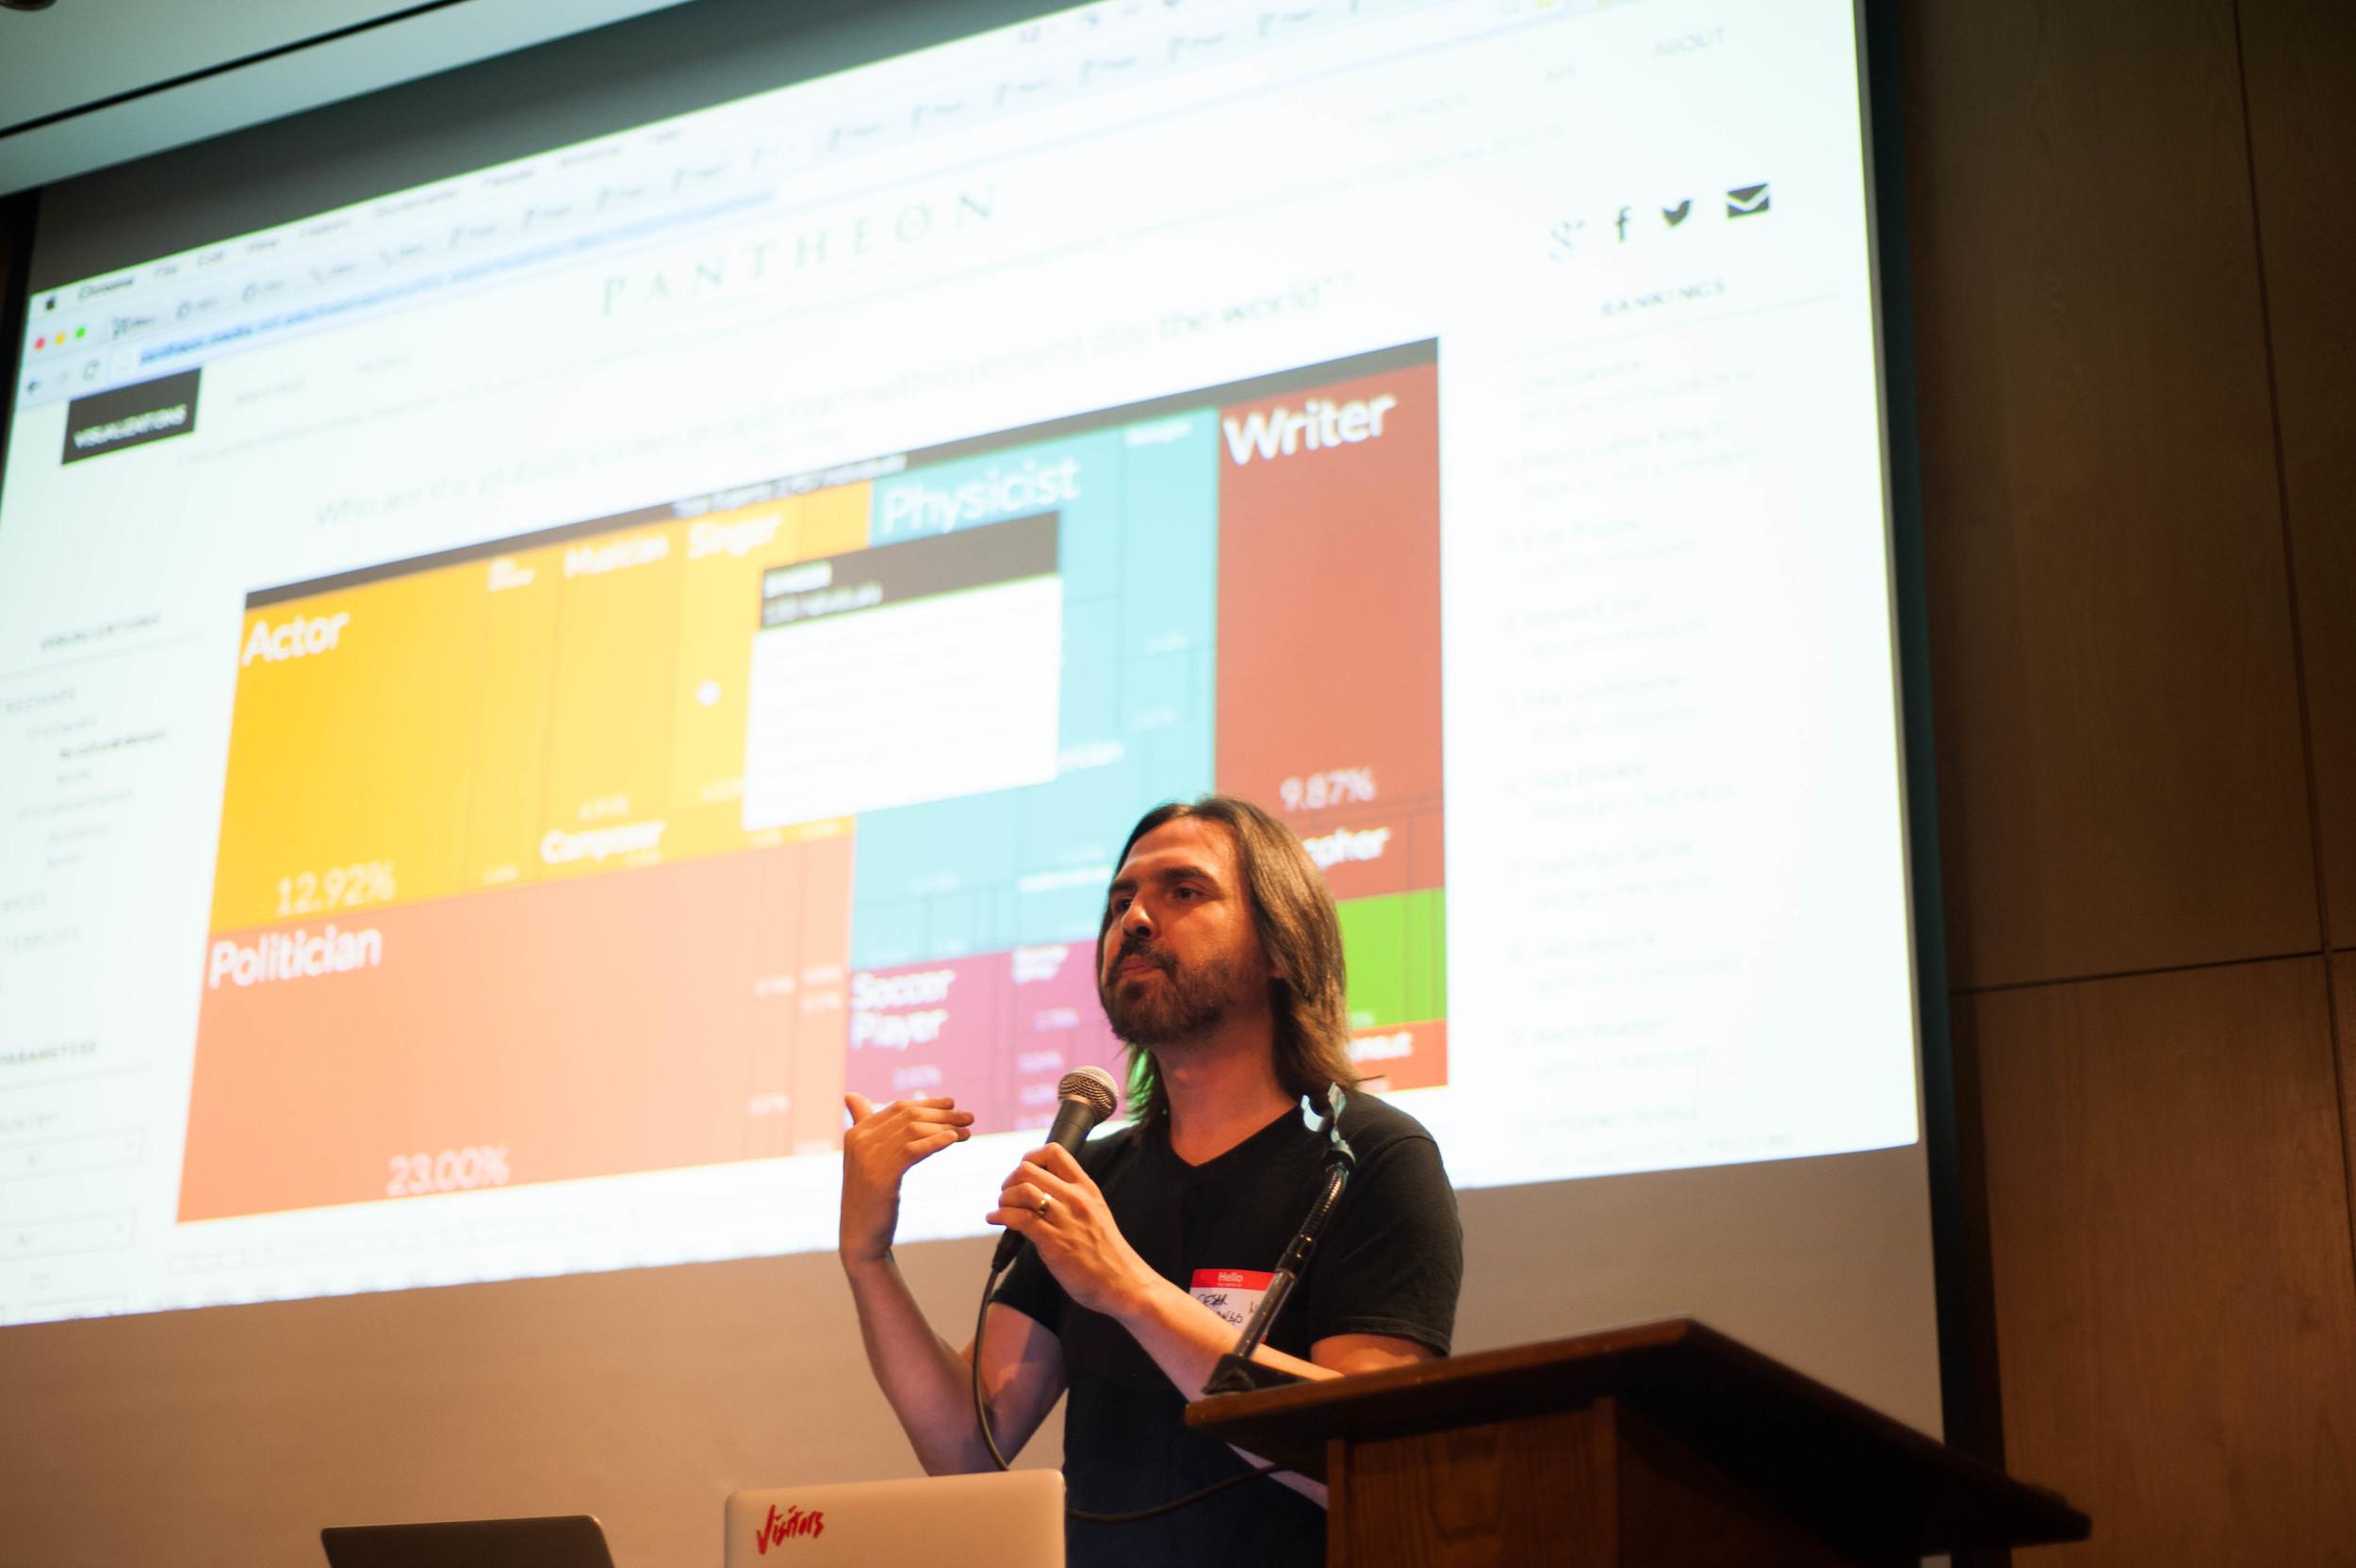 César A. Hidalgo, Assistant Professor at the MIT Media Lab presents an analog.  Photo Credit: Tiffany Knight / IDEO